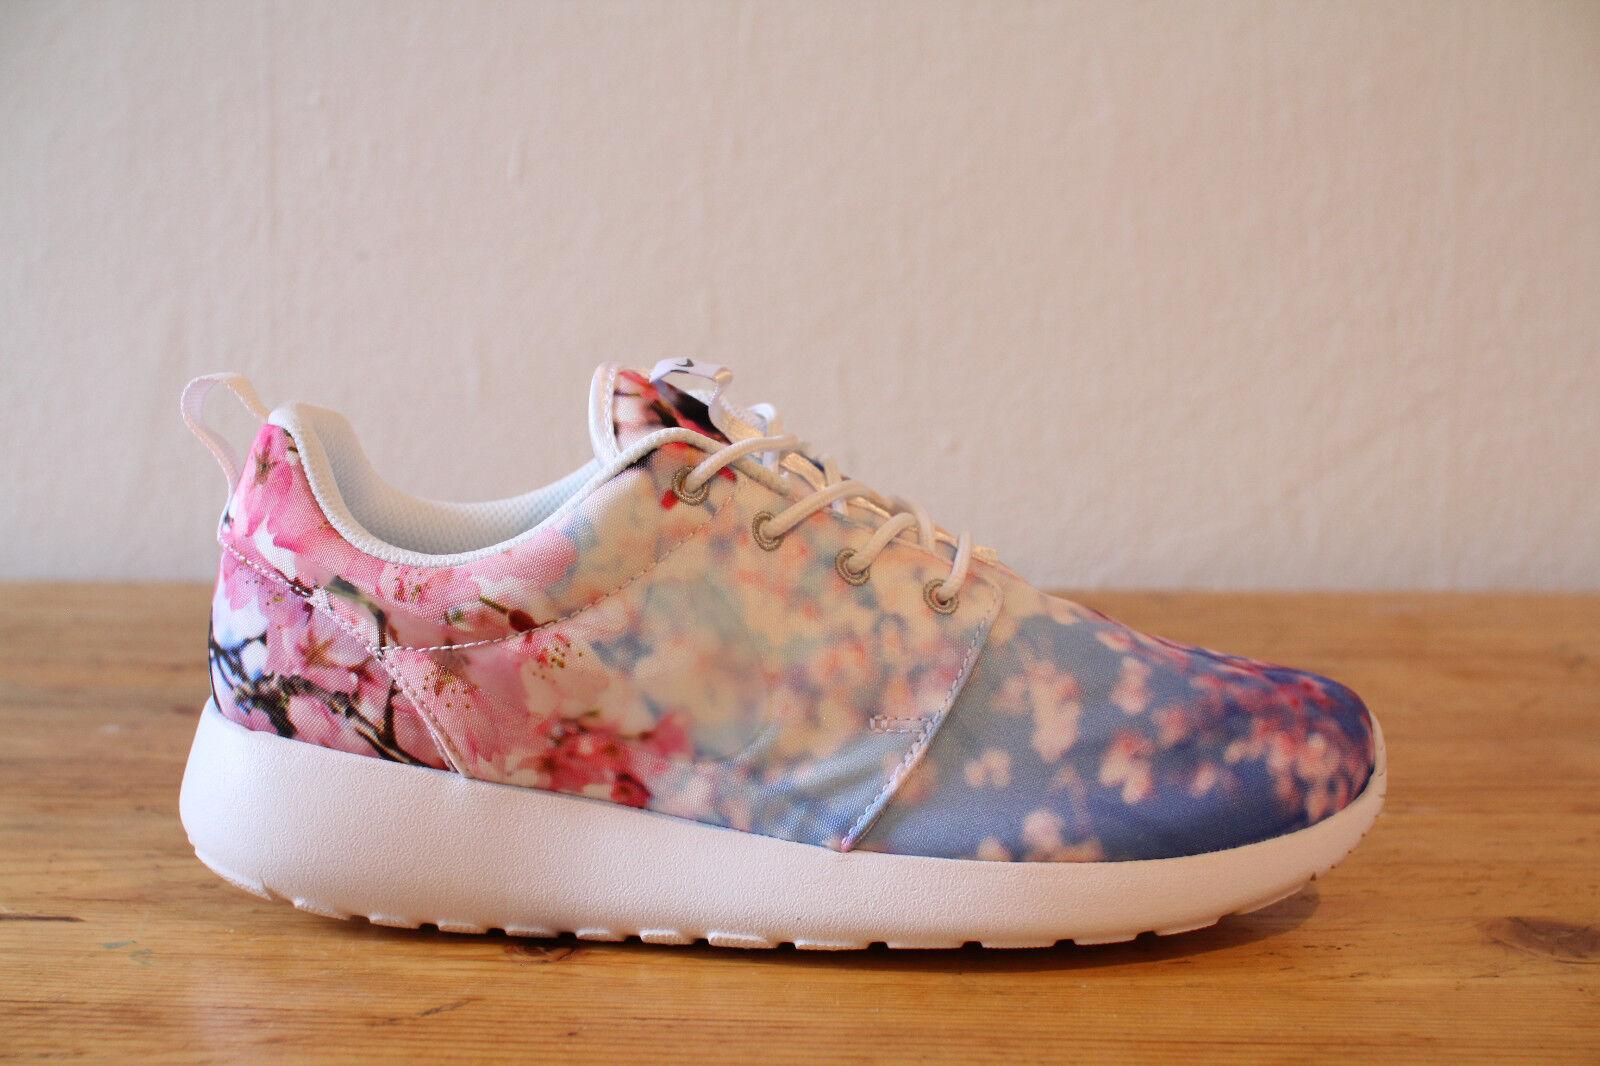 Nike Roshe One Print Cherry Blossom Pack Size 38,39,40 NEW & OVP Run